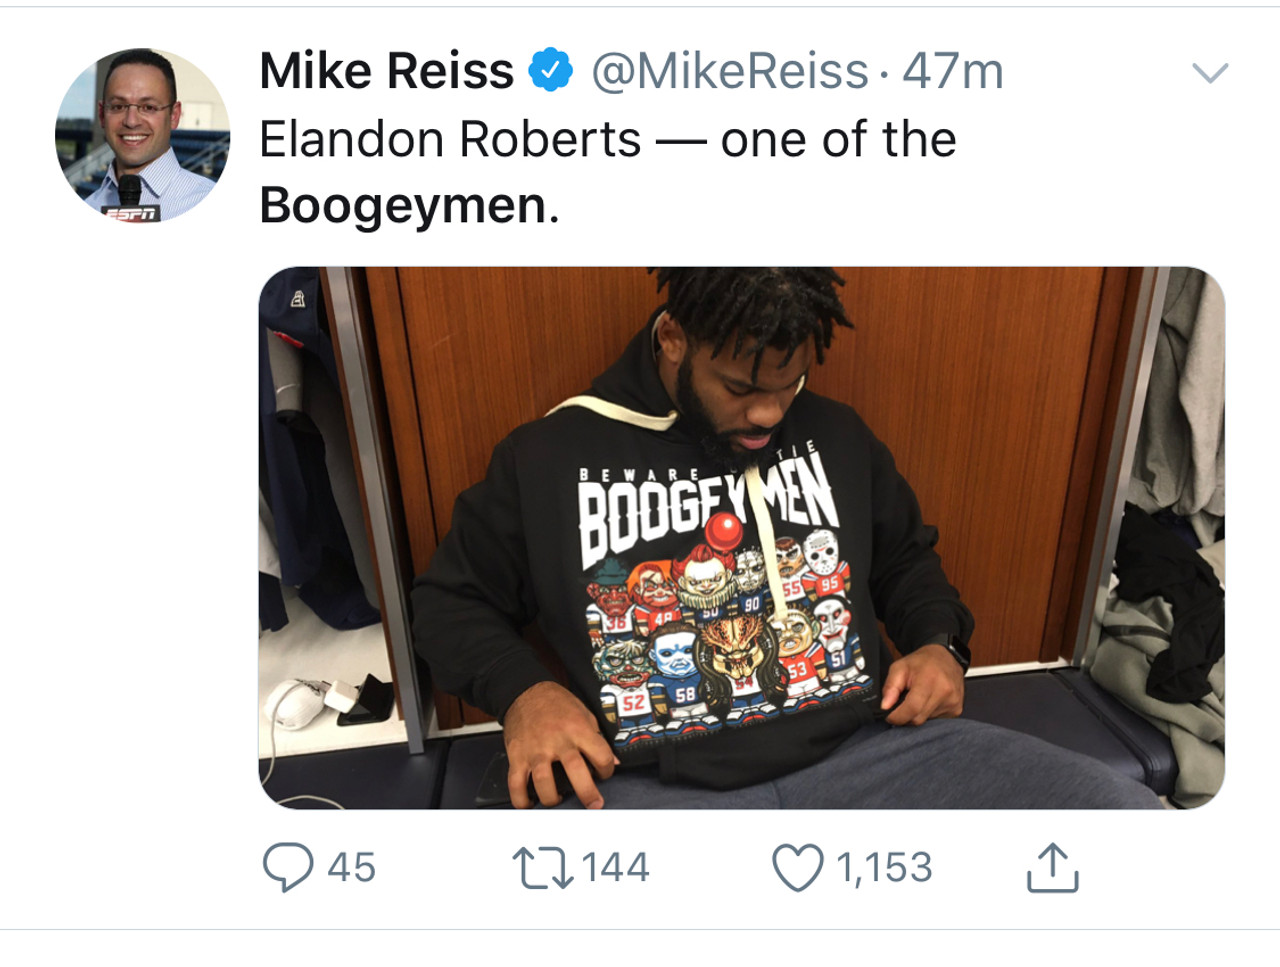 Beware of the Boogeymen T-shirt